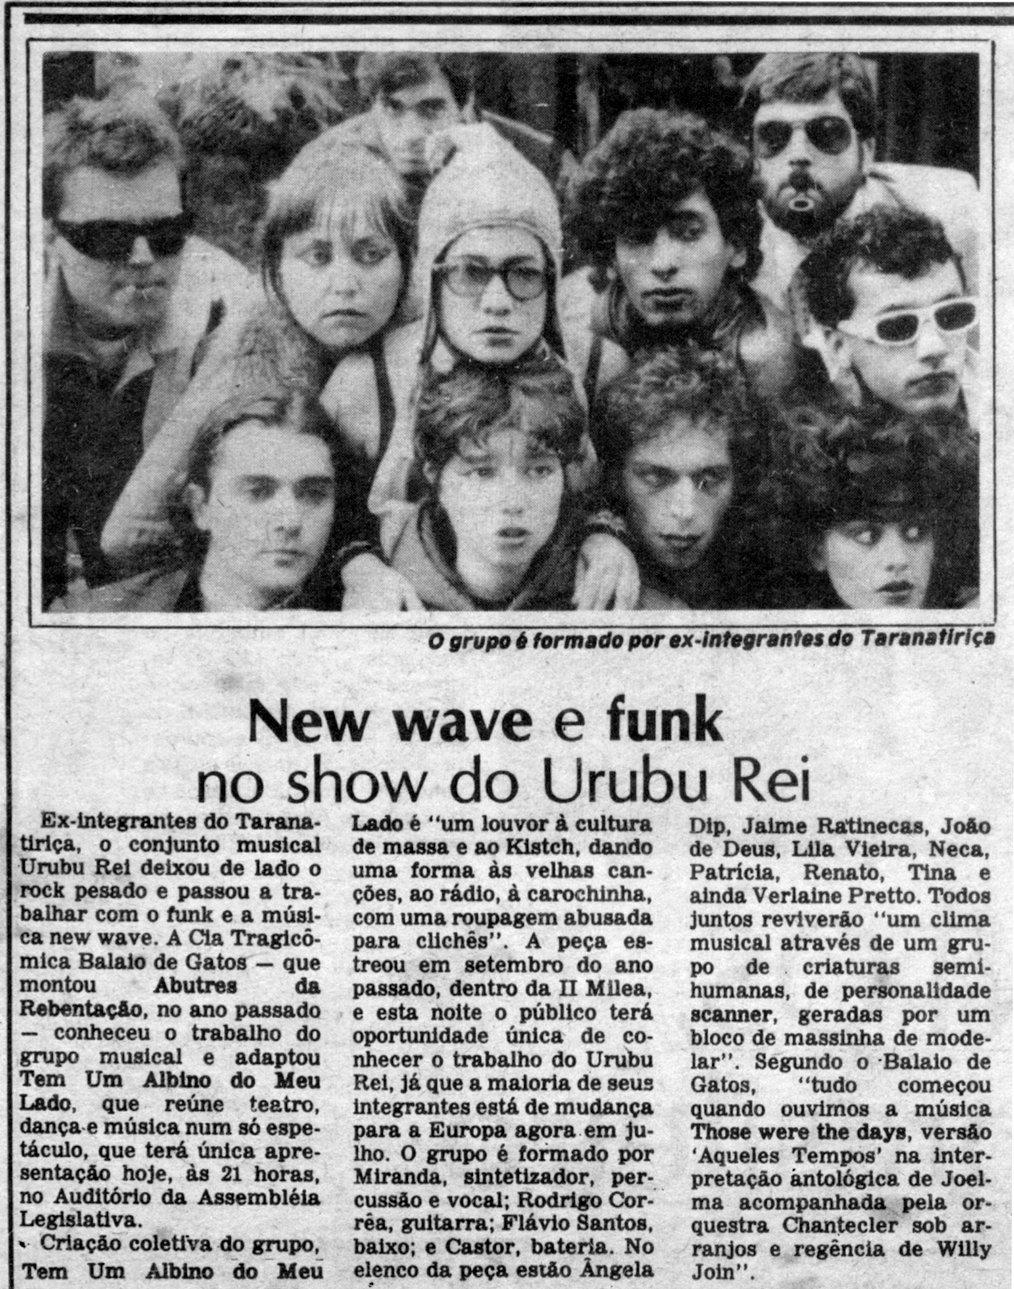 [PRESS] New Wave e Funk no show da Urubu Rei (origem da banda)